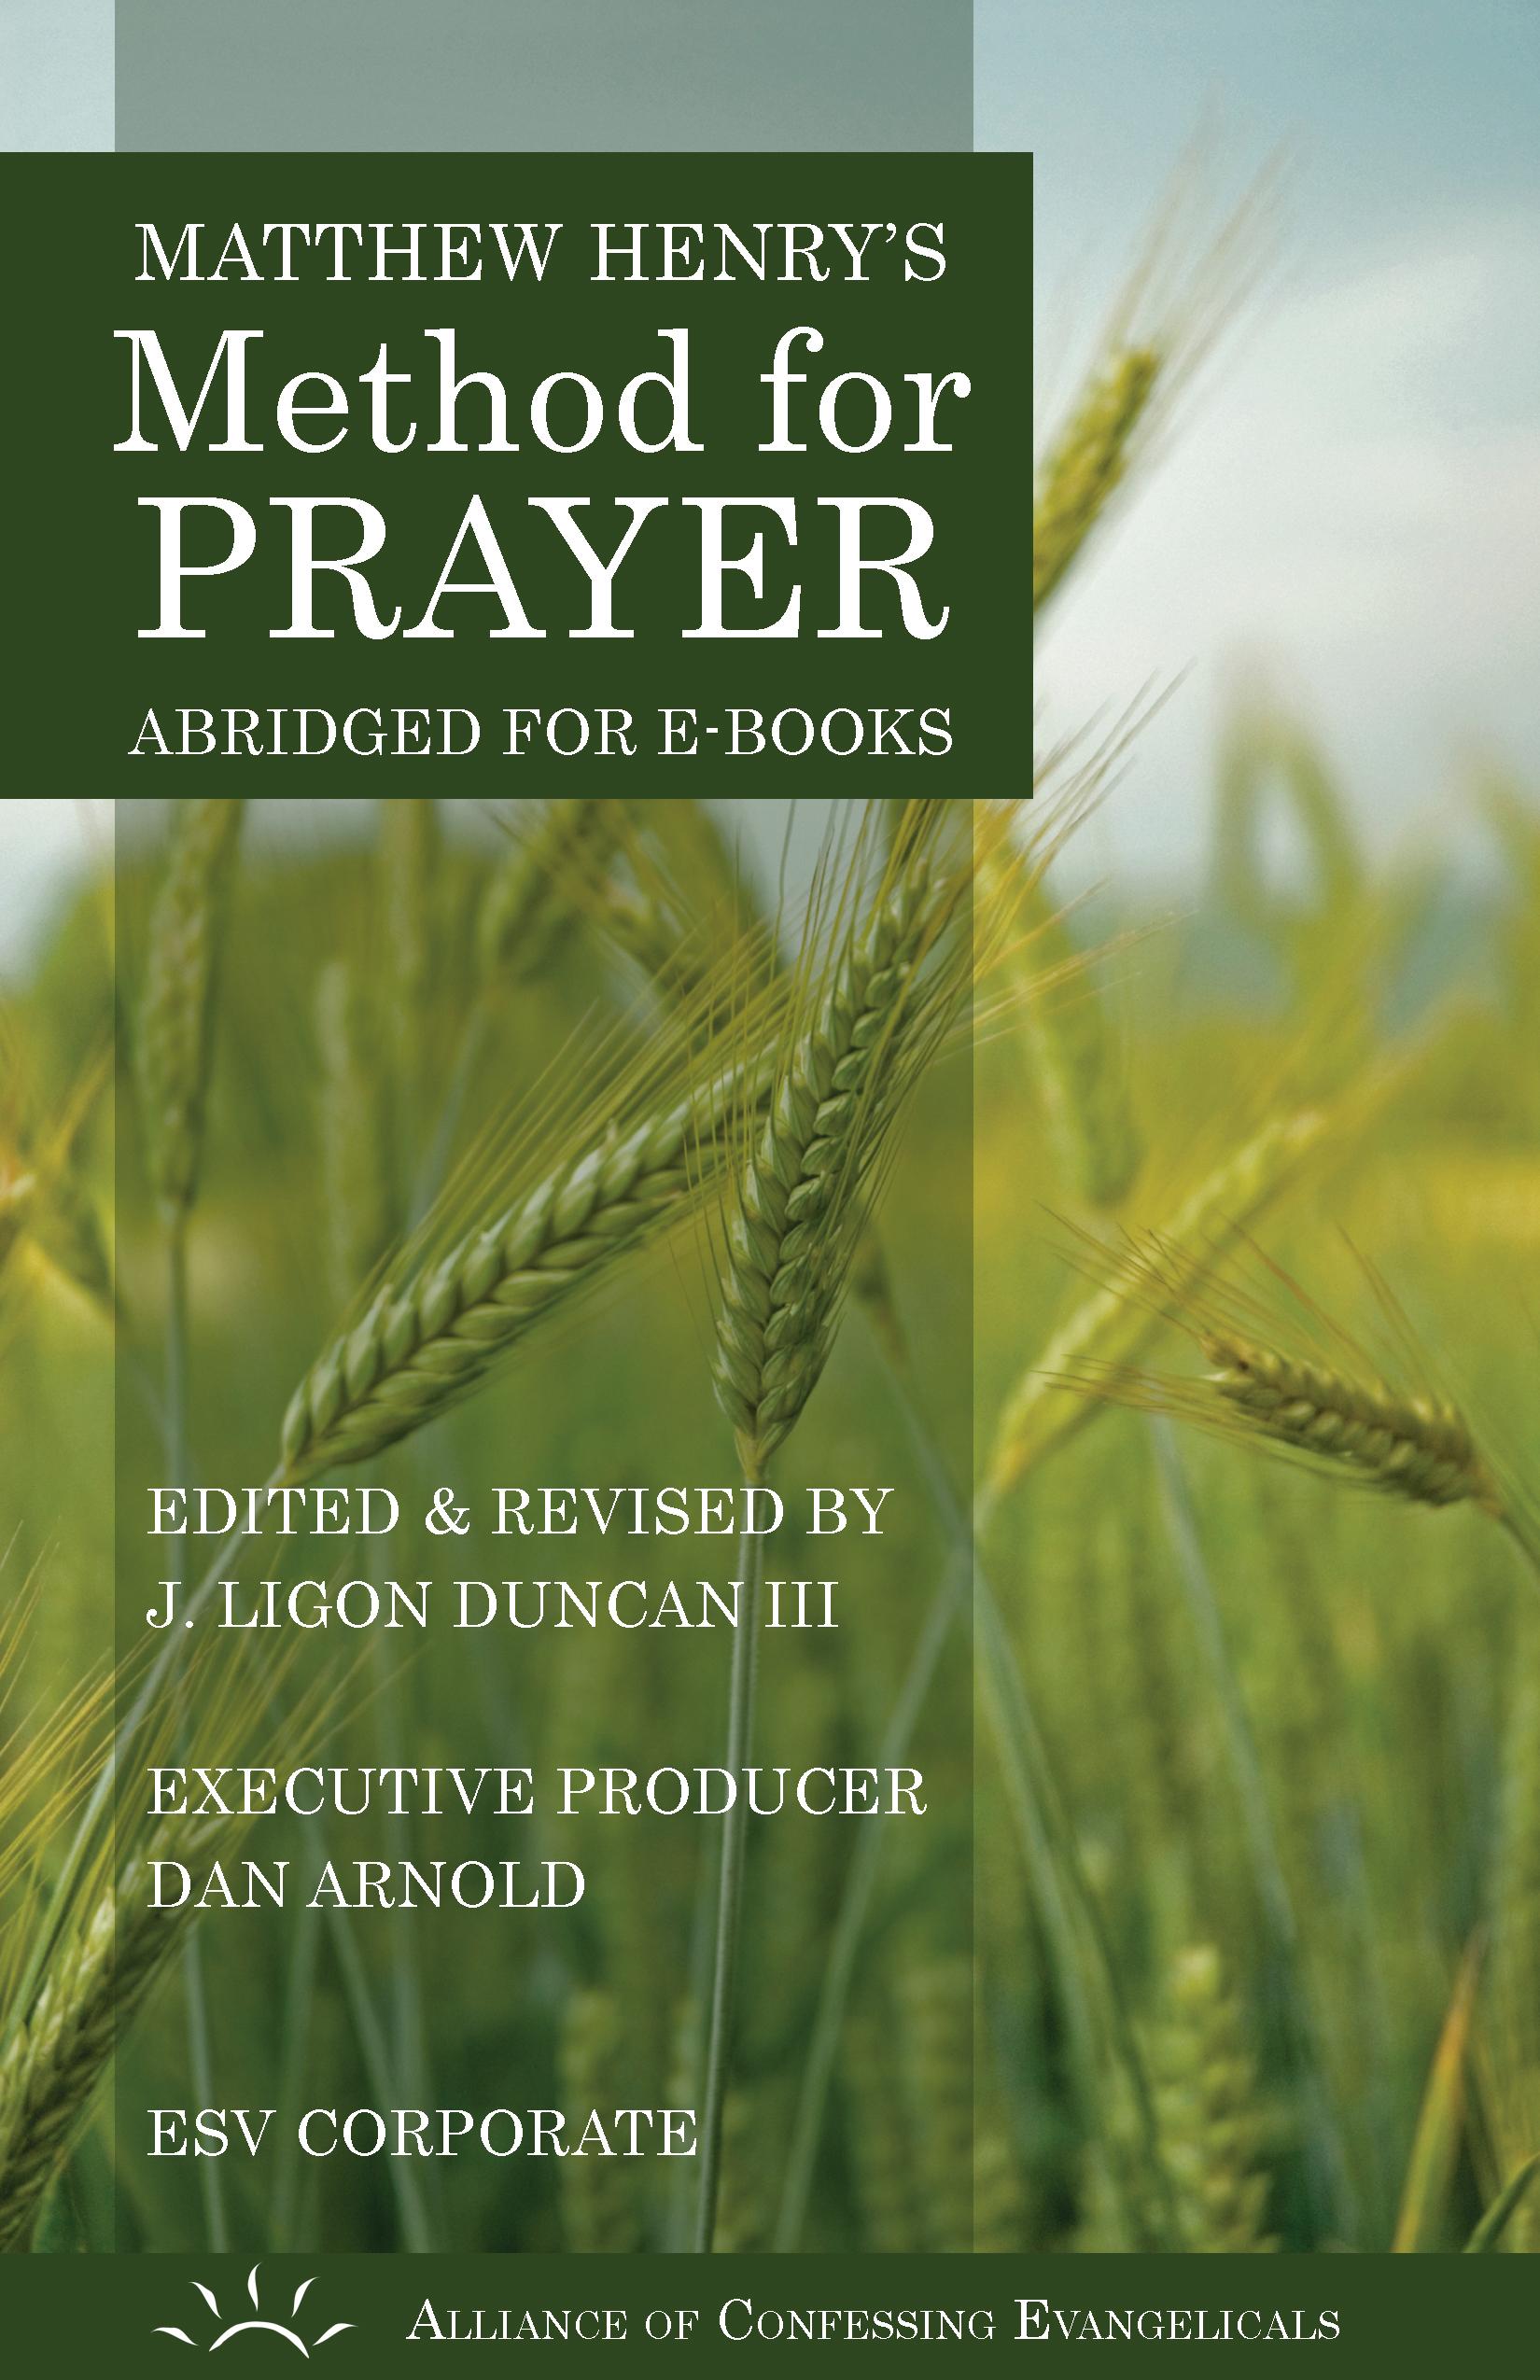 Matthew Henry's Method for Prayer (ESV Corporate Version), an Ebook by  Matthew Henry